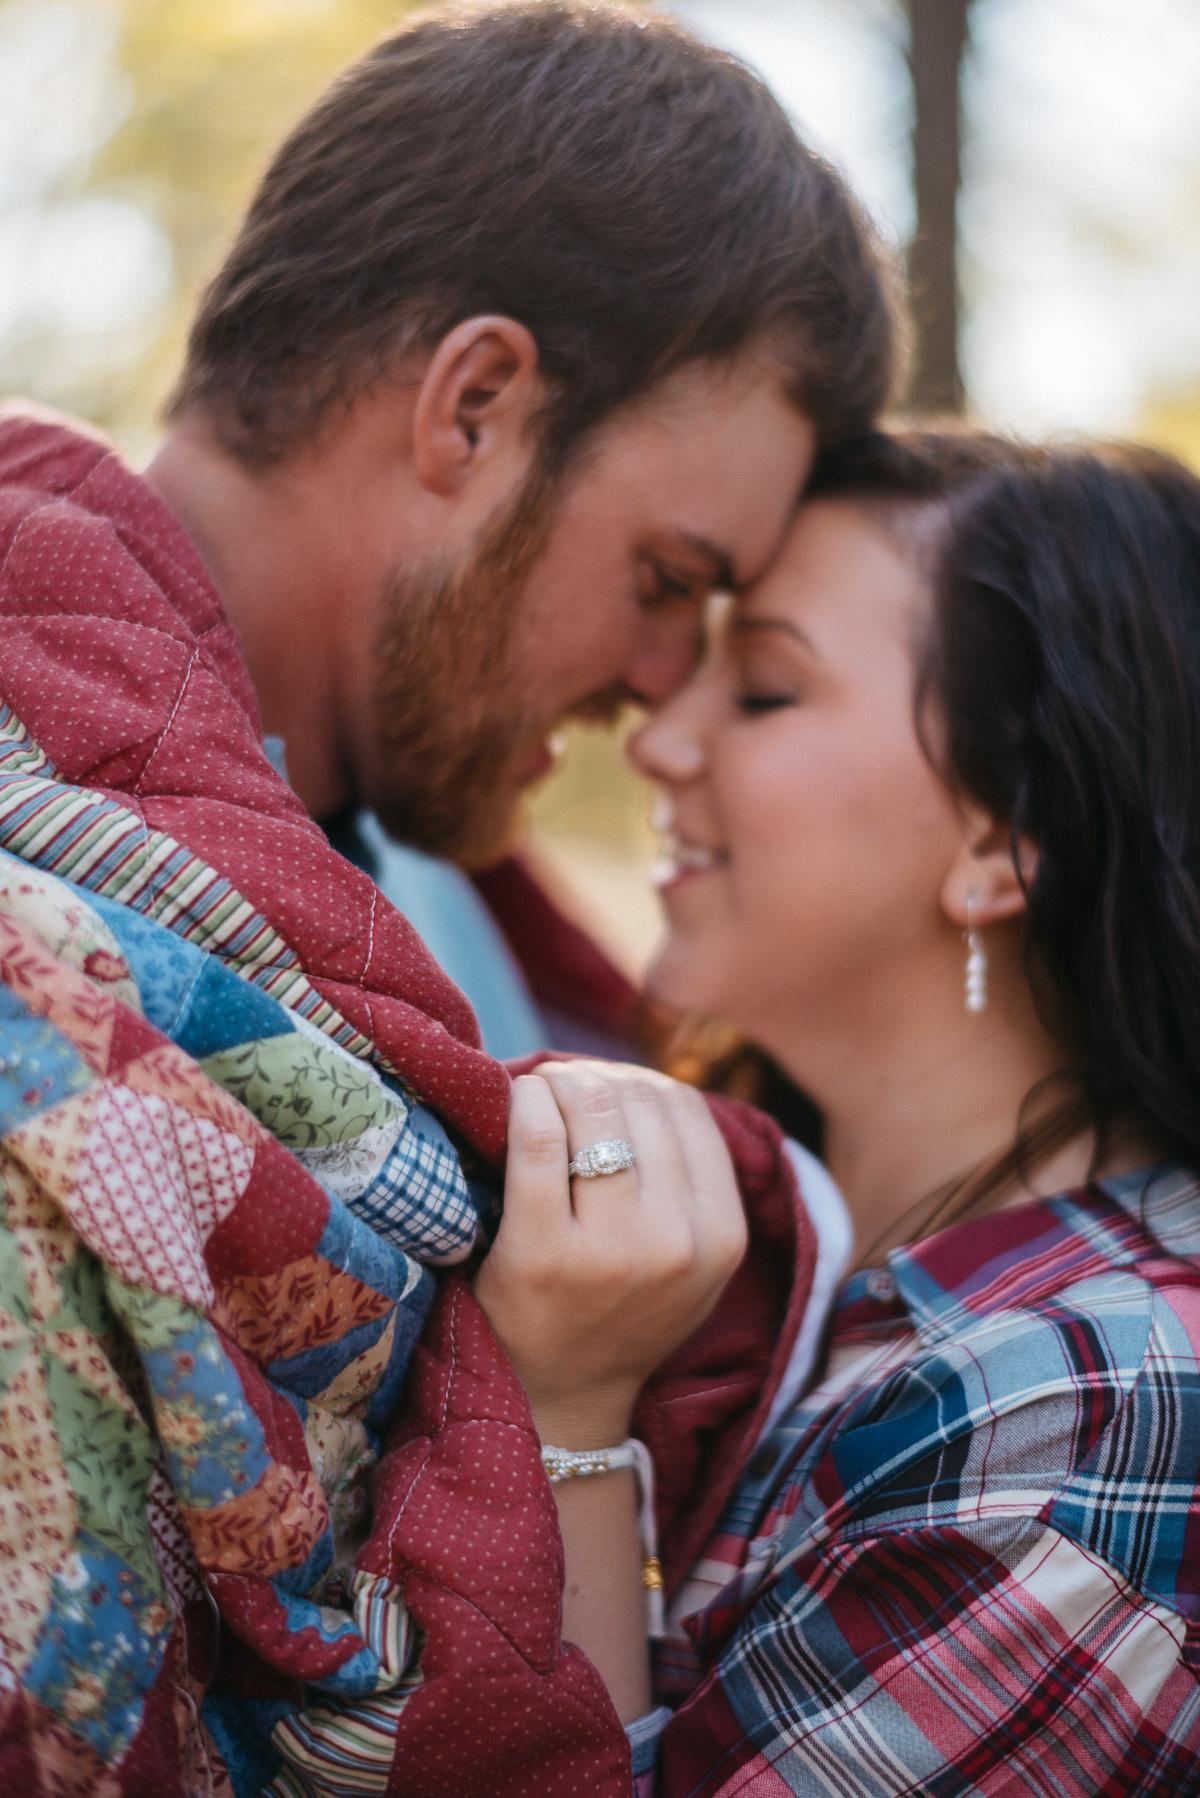 Engagement photography at Grand Gulf Military Park near Vicksburg, Mississippi